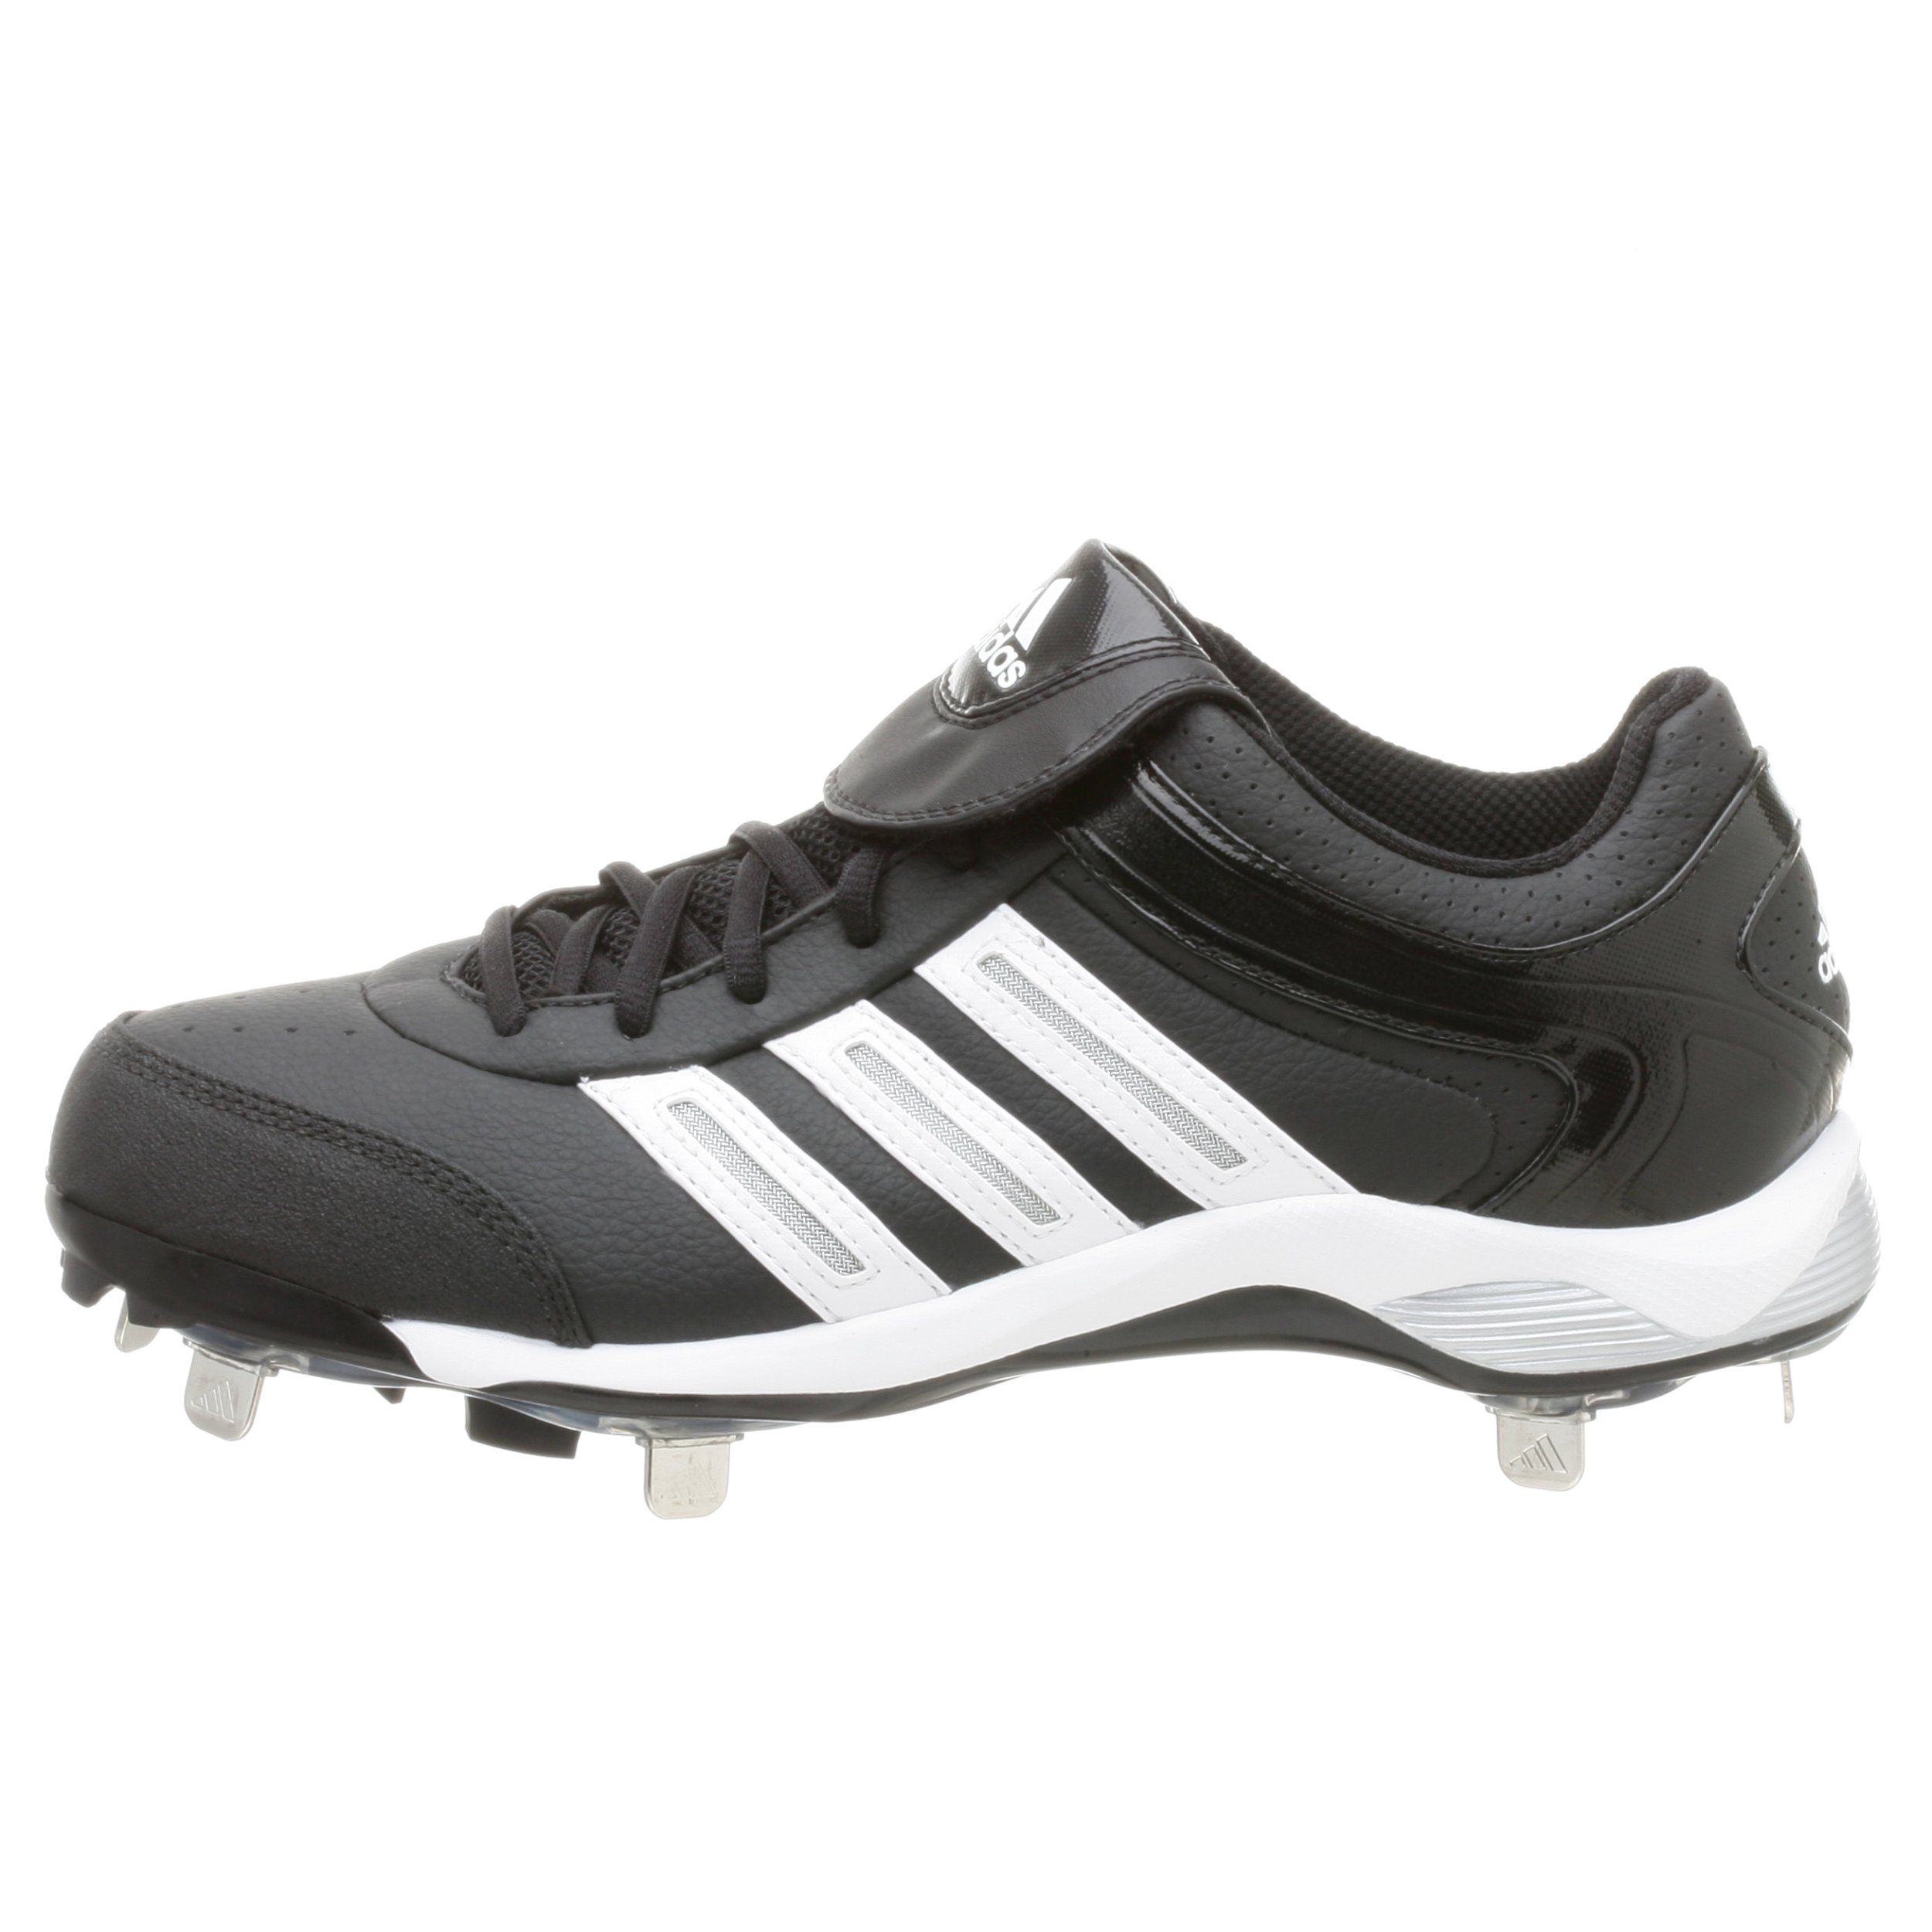 adidas Men's Diamond King Low Baseball Shoe,Blk/Runwht/Metsil,9.5 M by adidas (Image #6)